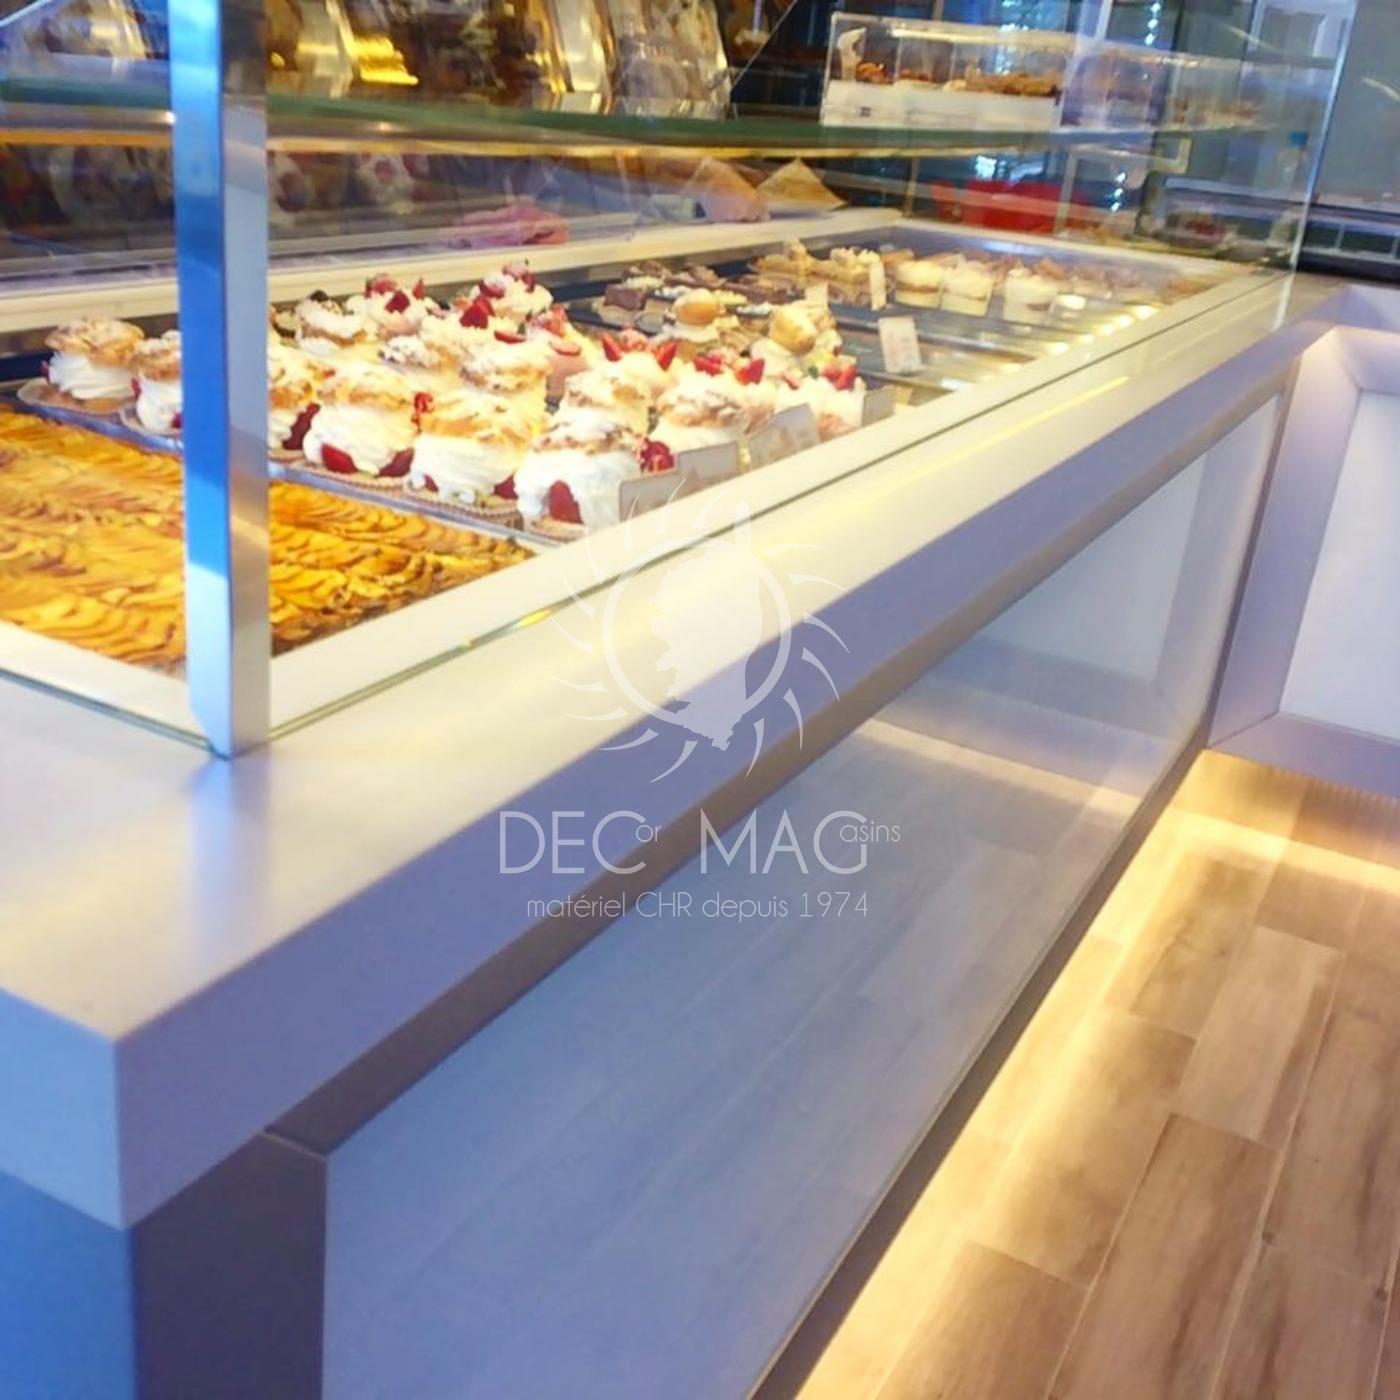 decor magasins nos r alisations boulangerie sauveur multari agencement complet bastia et. Black Bedroom Furniture Sets. Home Design Ideas